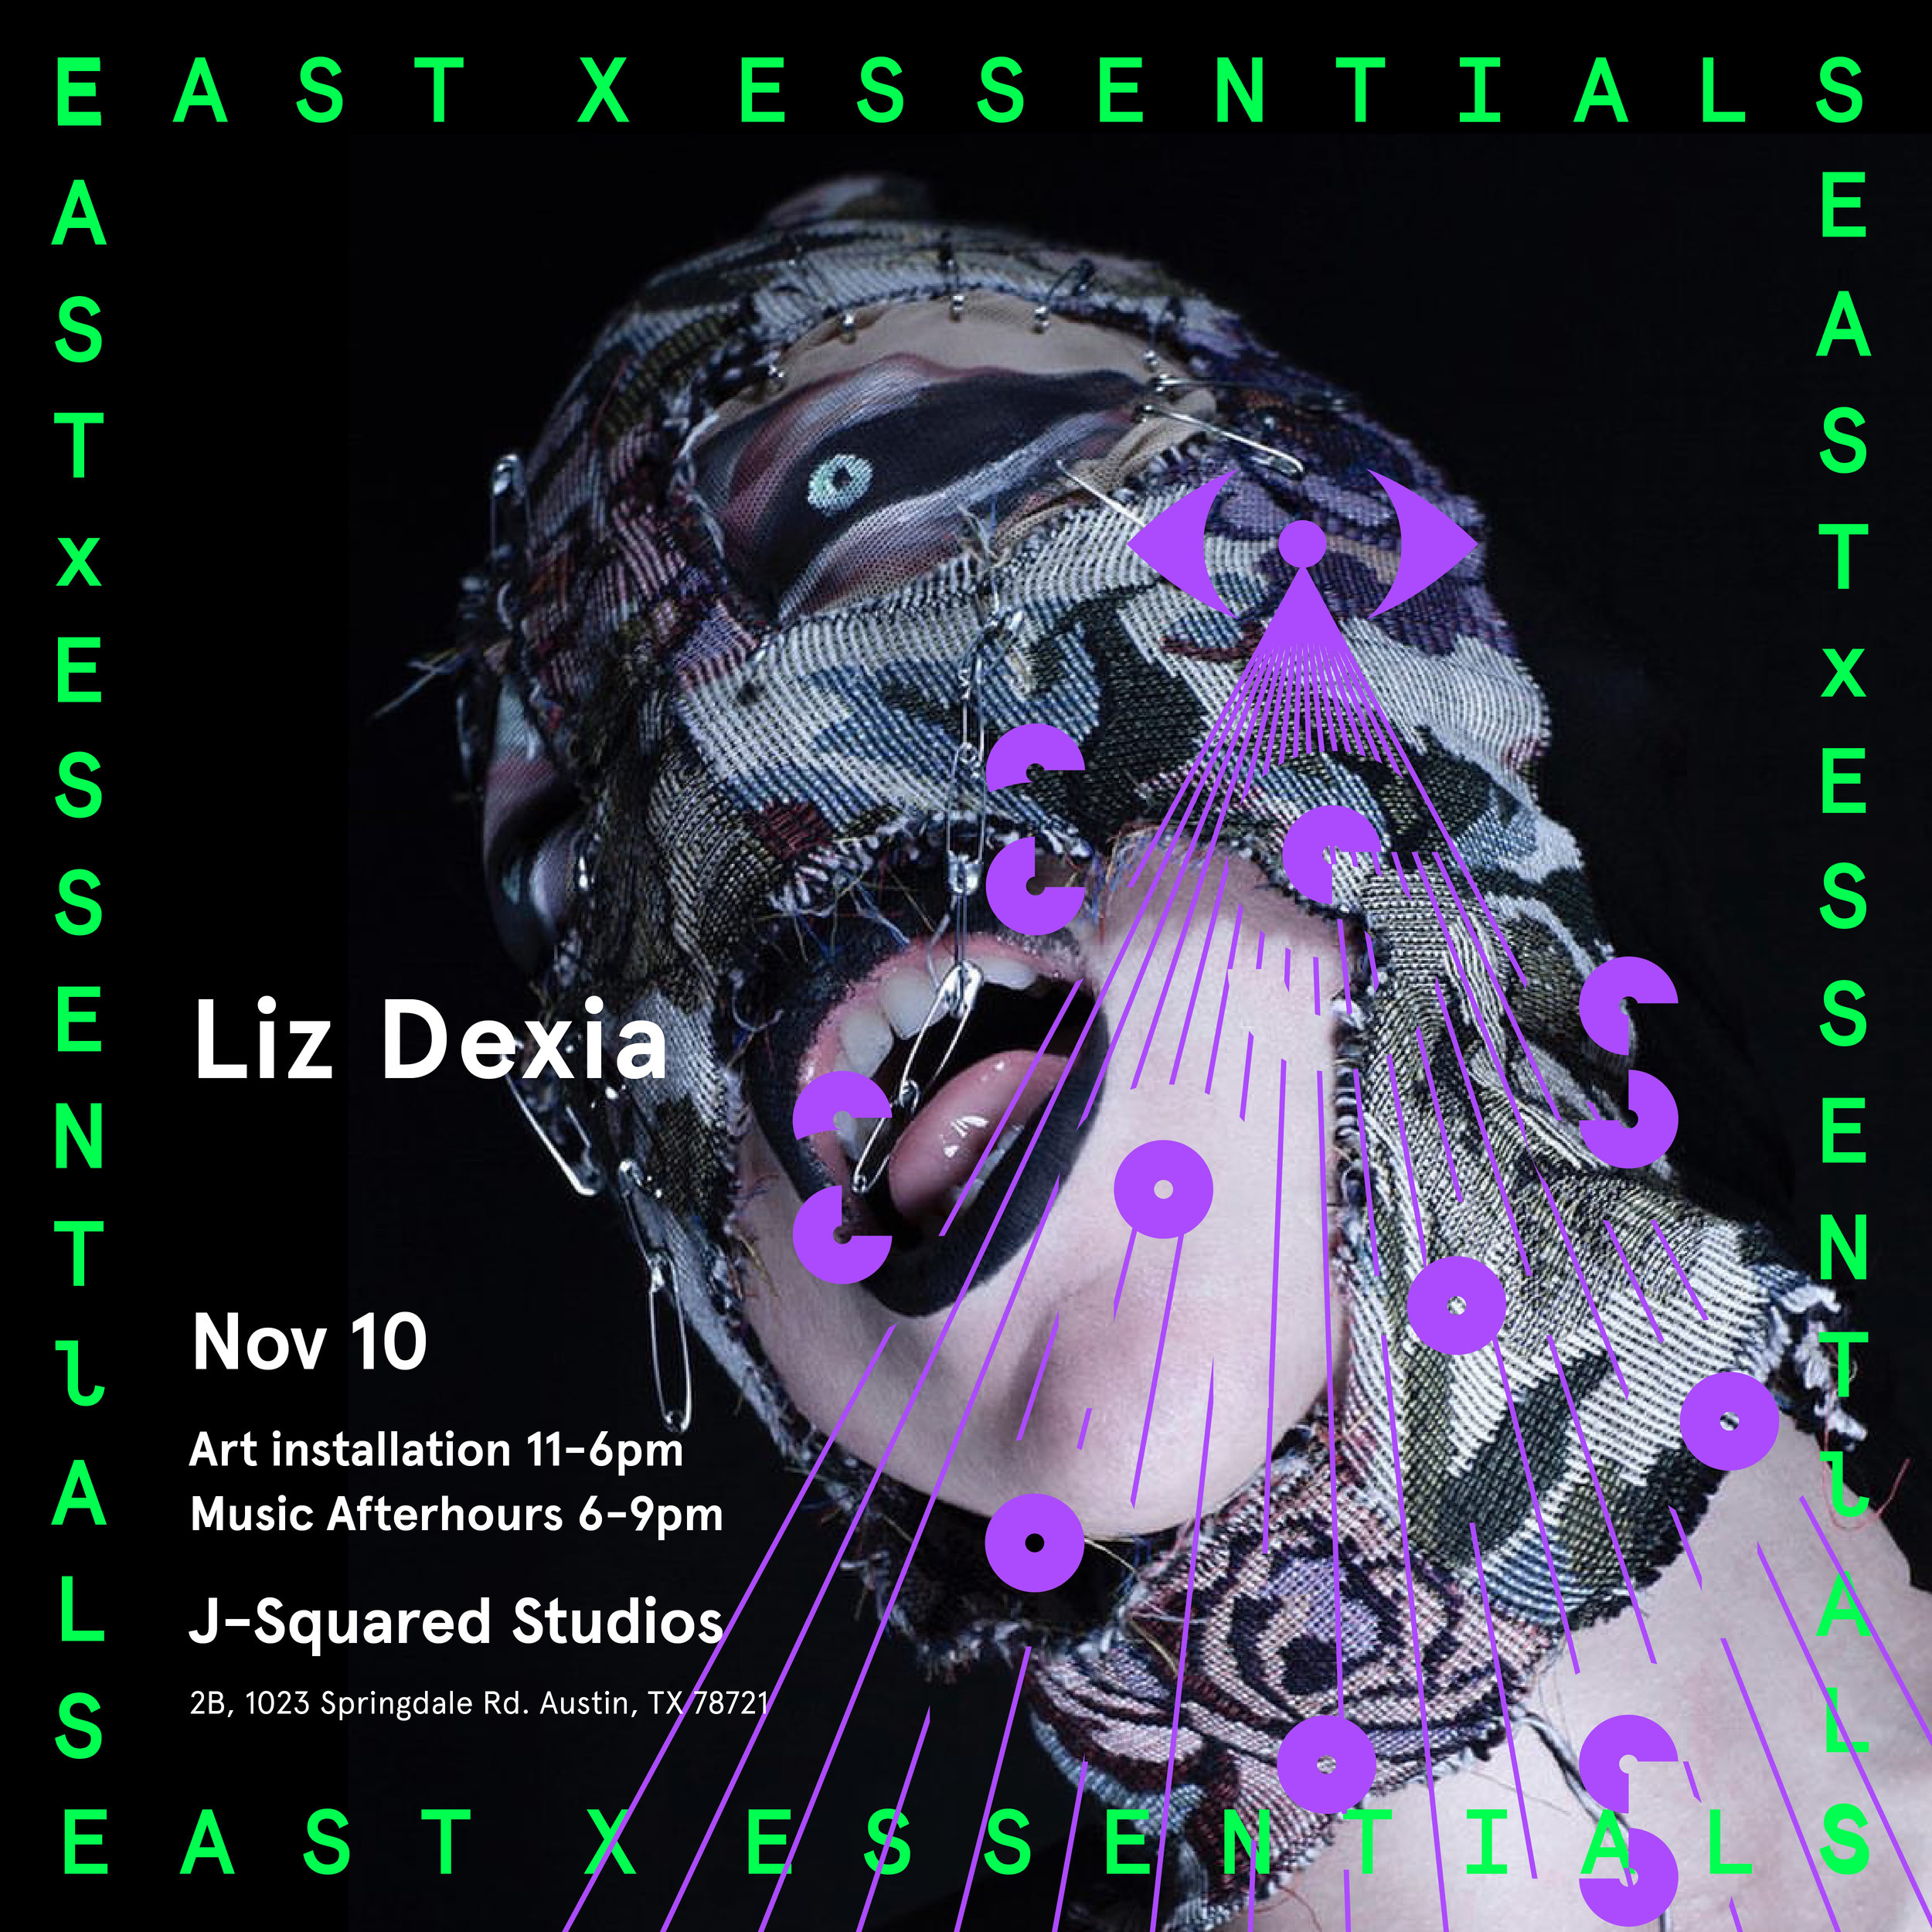 Liz Dexia, Alternate flyer for EAST X ESSENTIALS CREATIVE